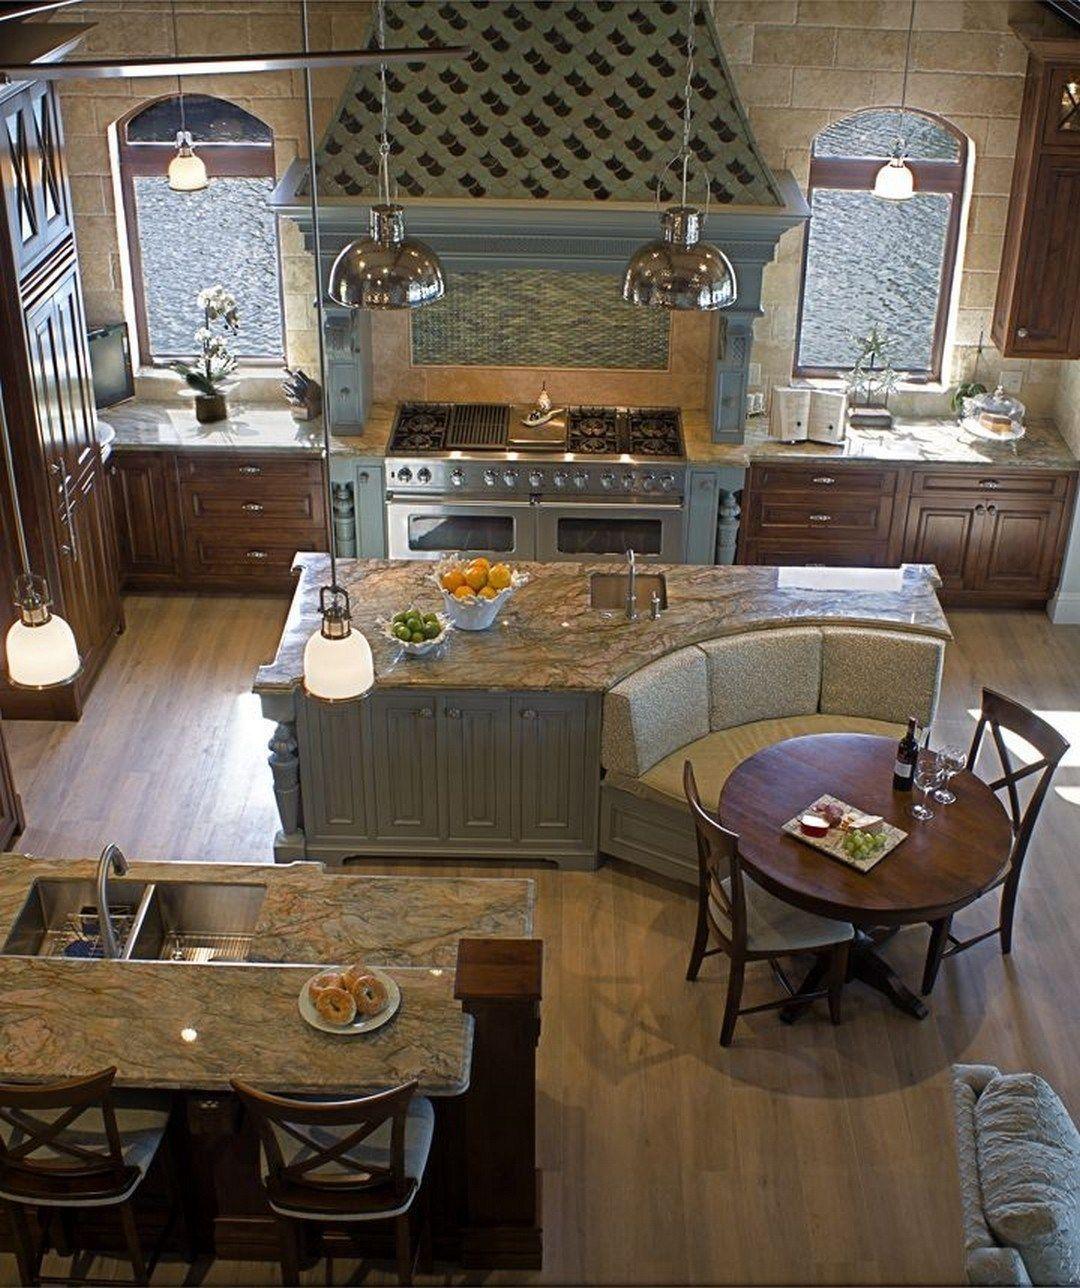 Kitchen Ideas With Island Kitchen Island With Seating And Sink Kitchen Design Kitchen Island Decor Kitchen Island Design